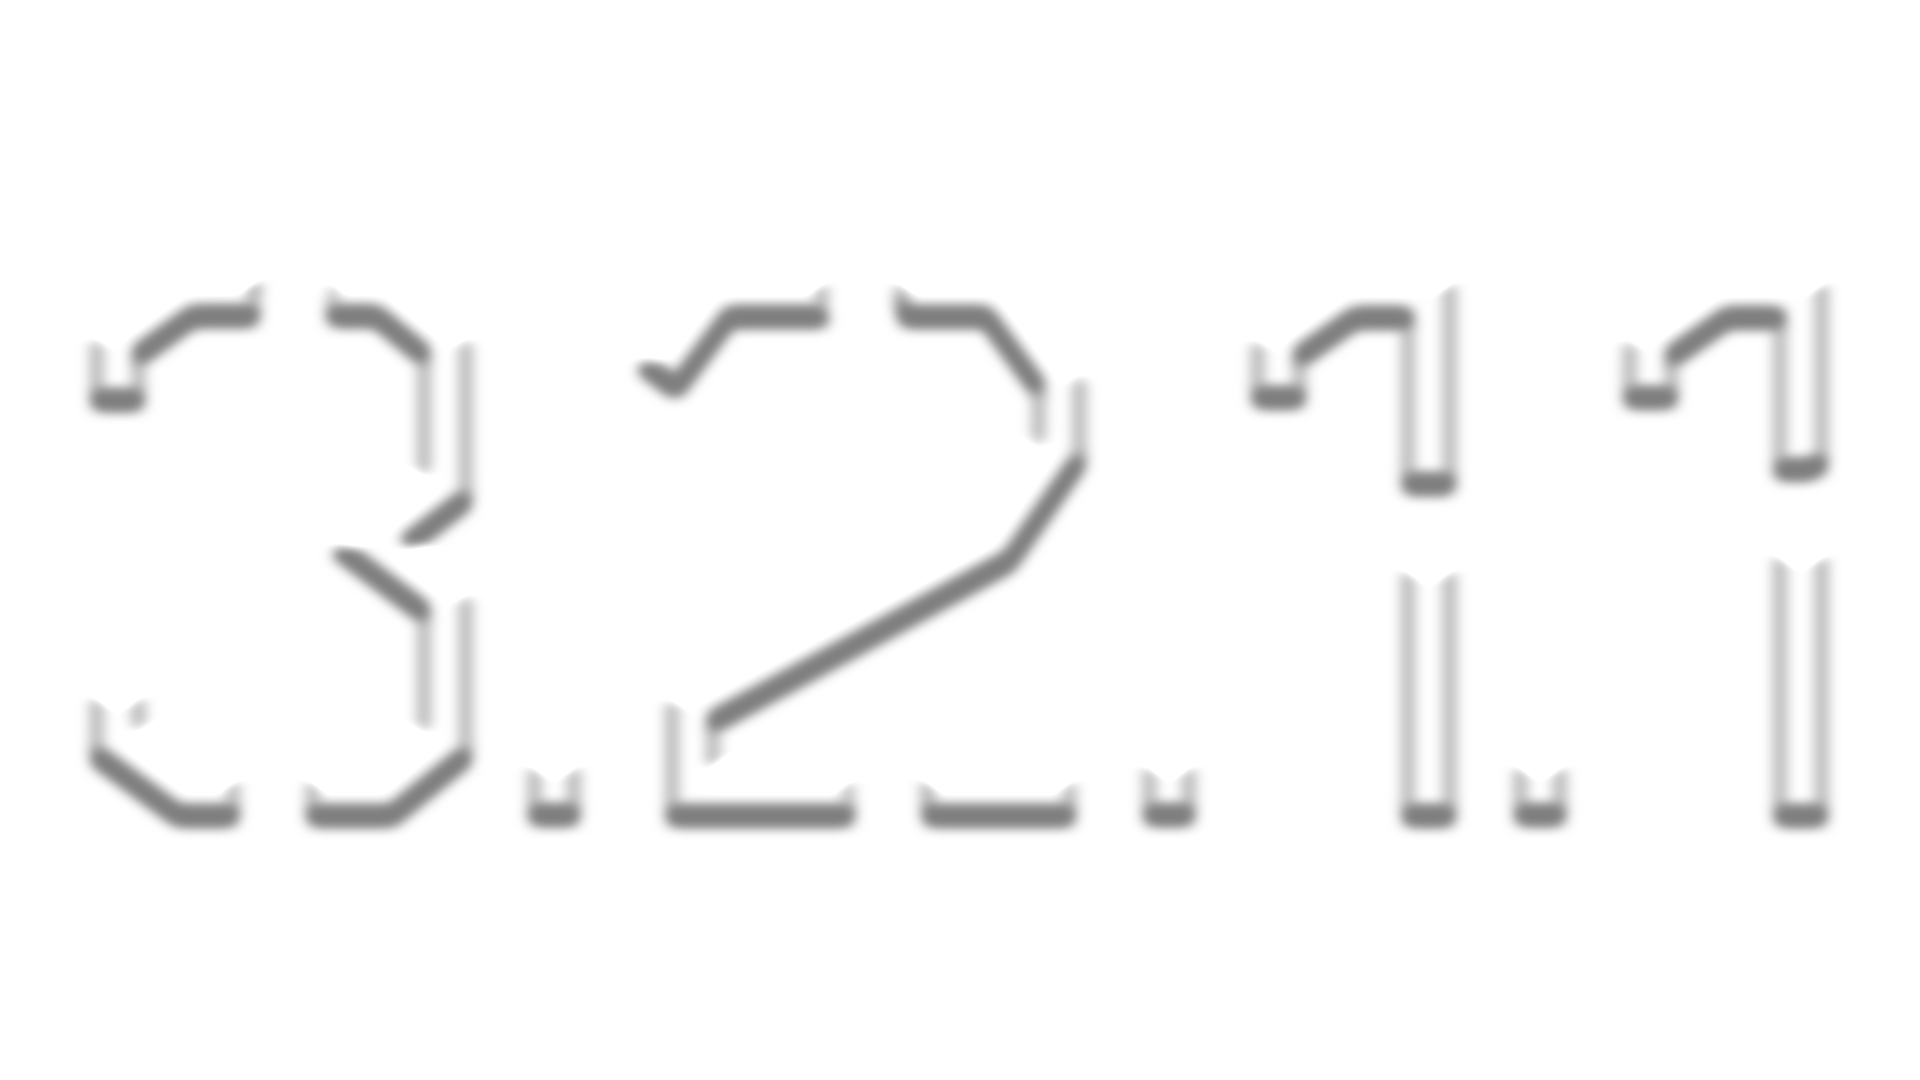 3-2-1-1